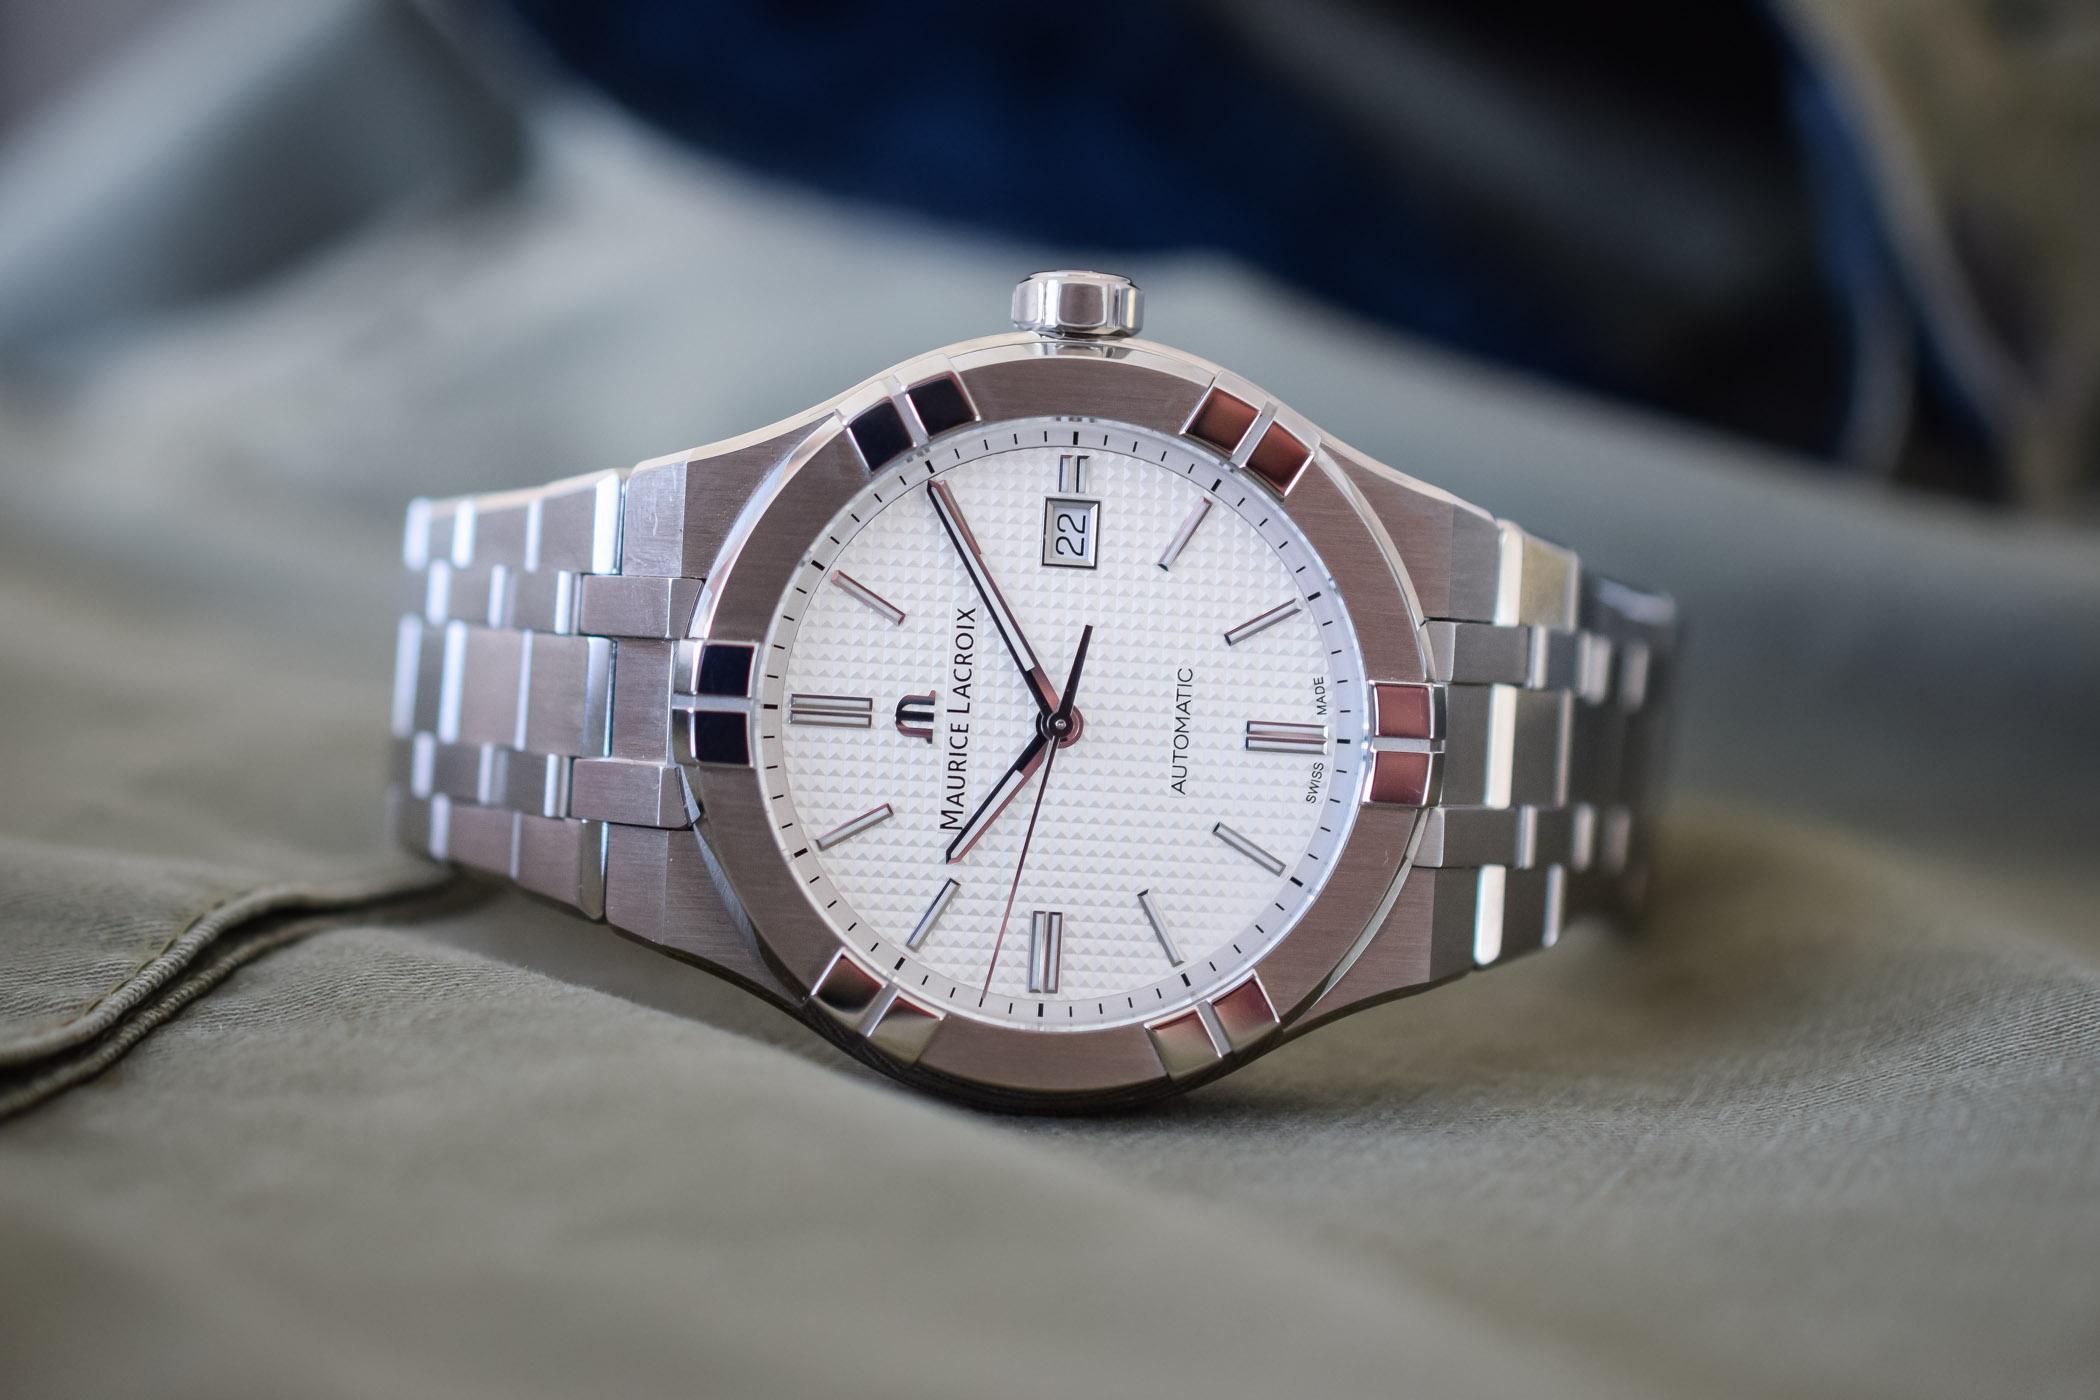 Maurice Lacroix Aikon Automatic chronograph - Baselworld 2018 - 13